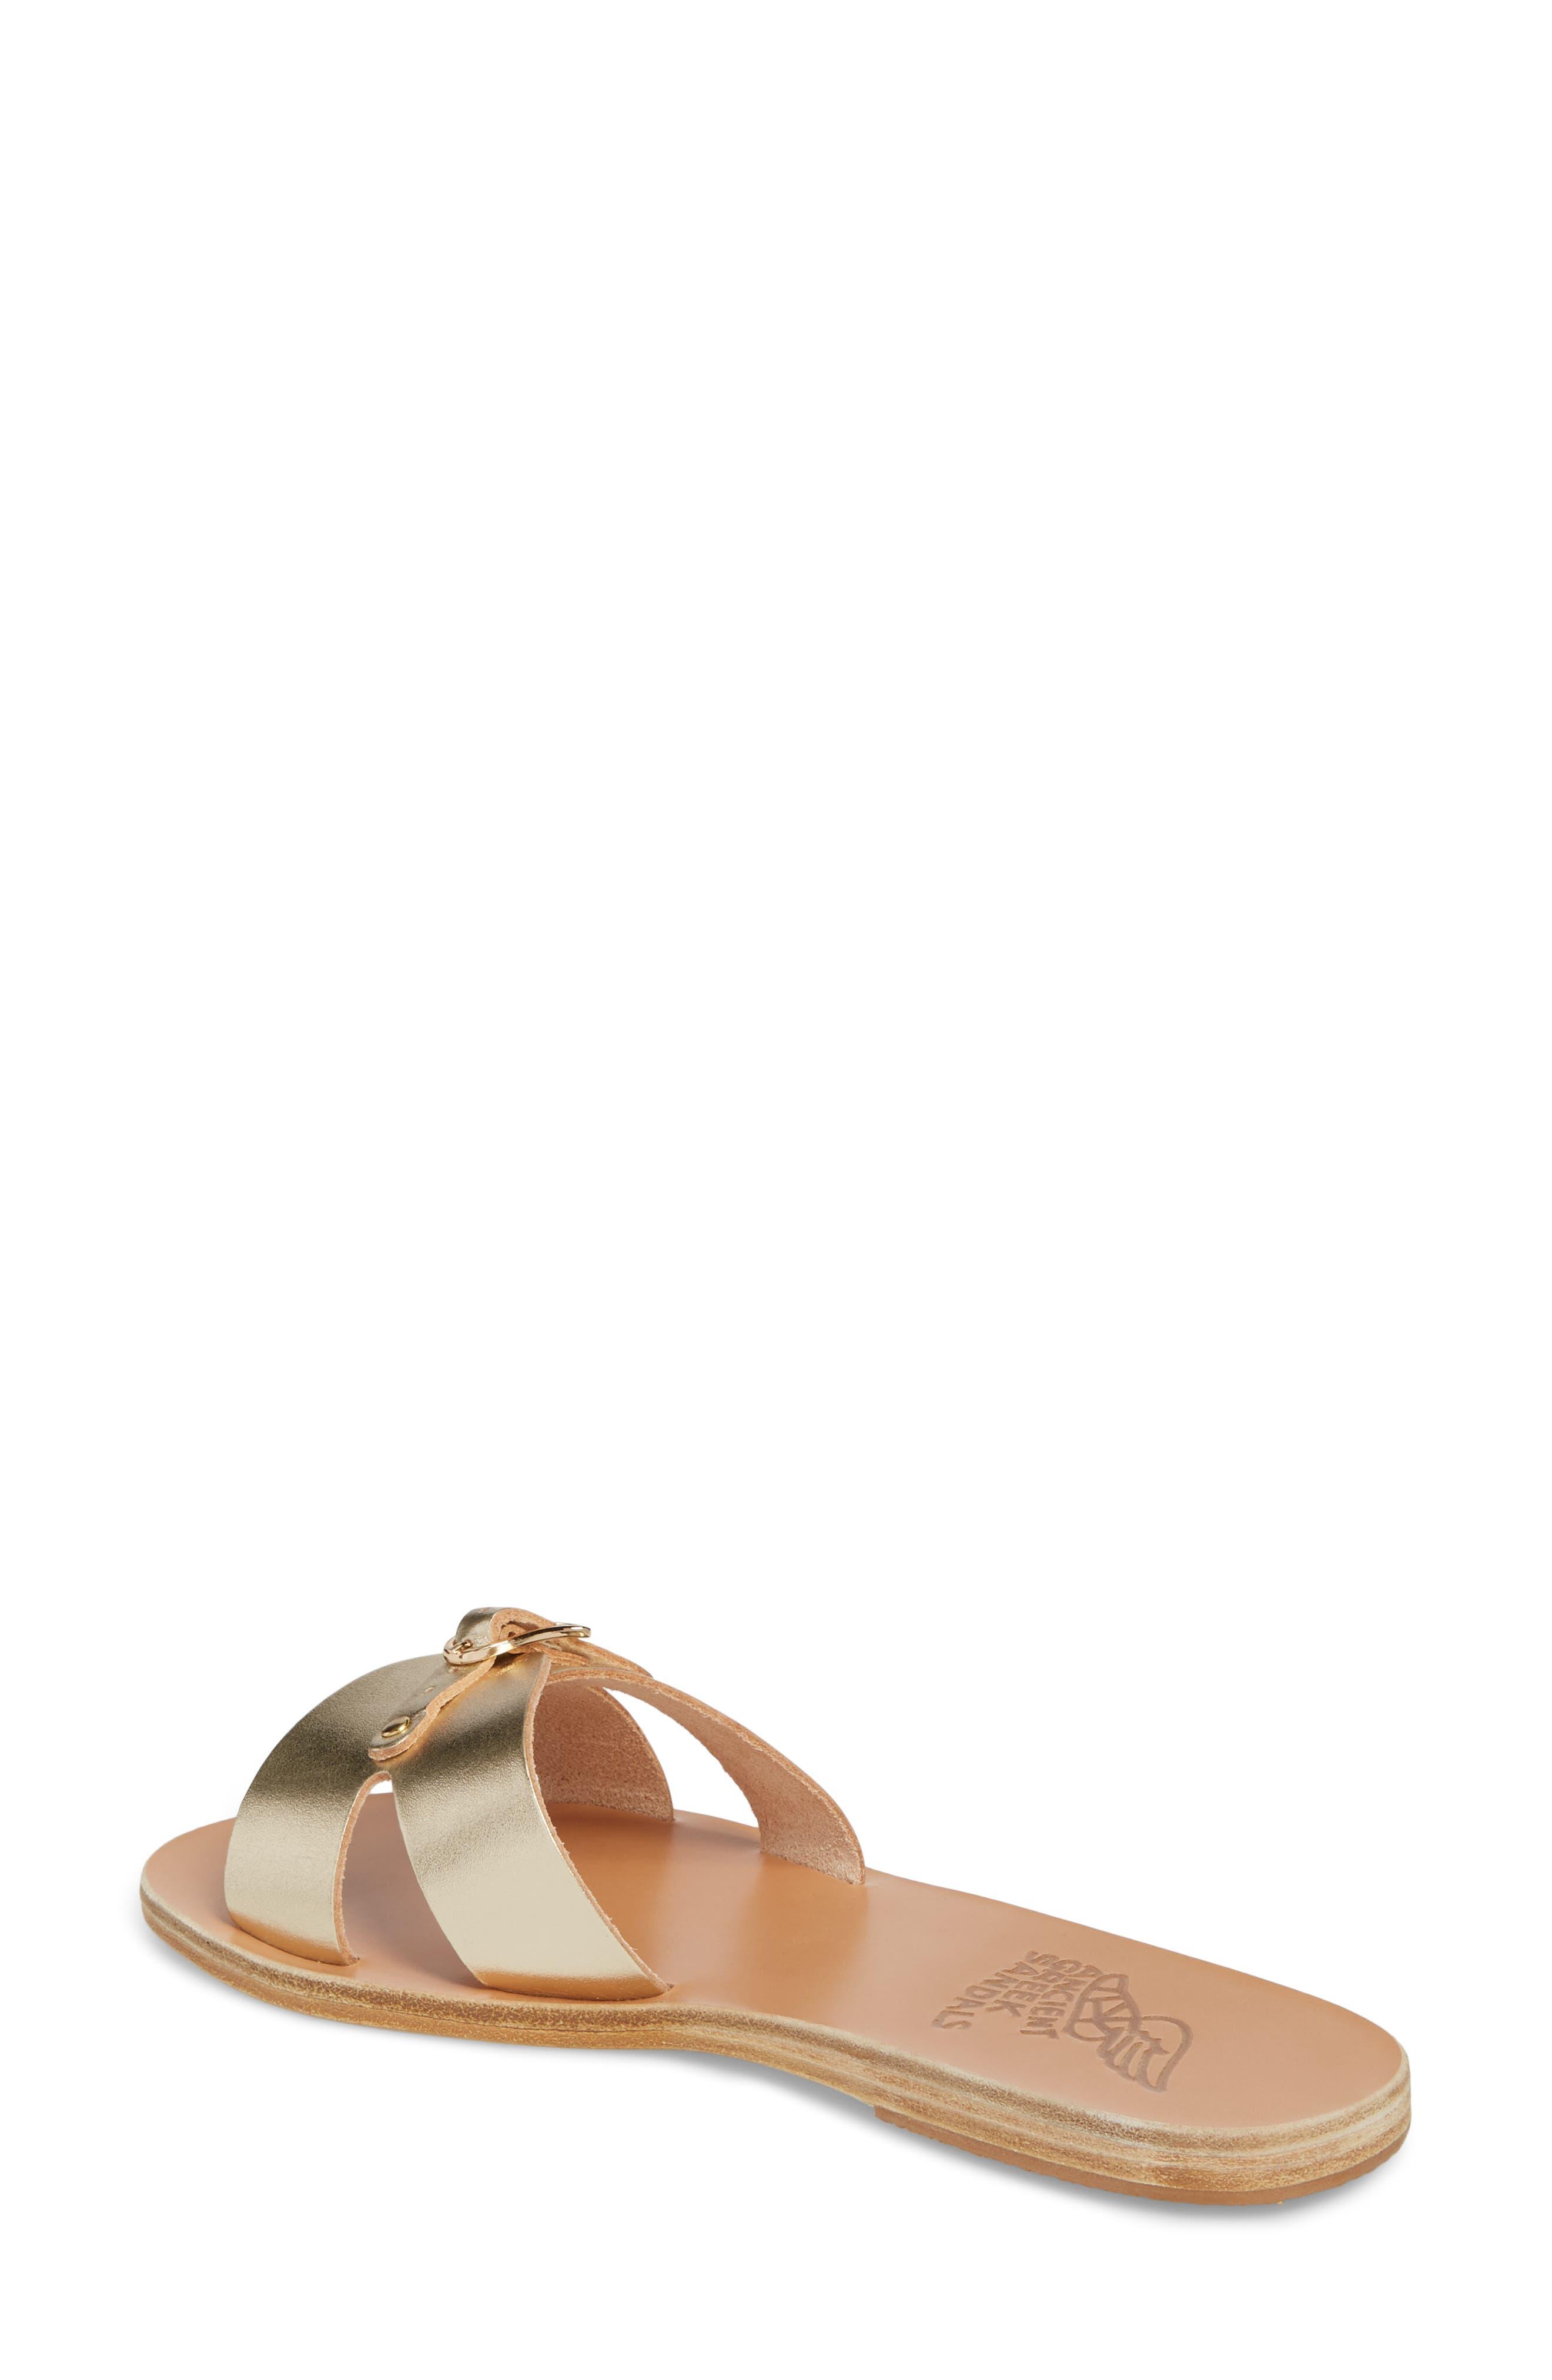 Womens Sandals Sale Nordstrom Elaine Teal Top Leux Studio L